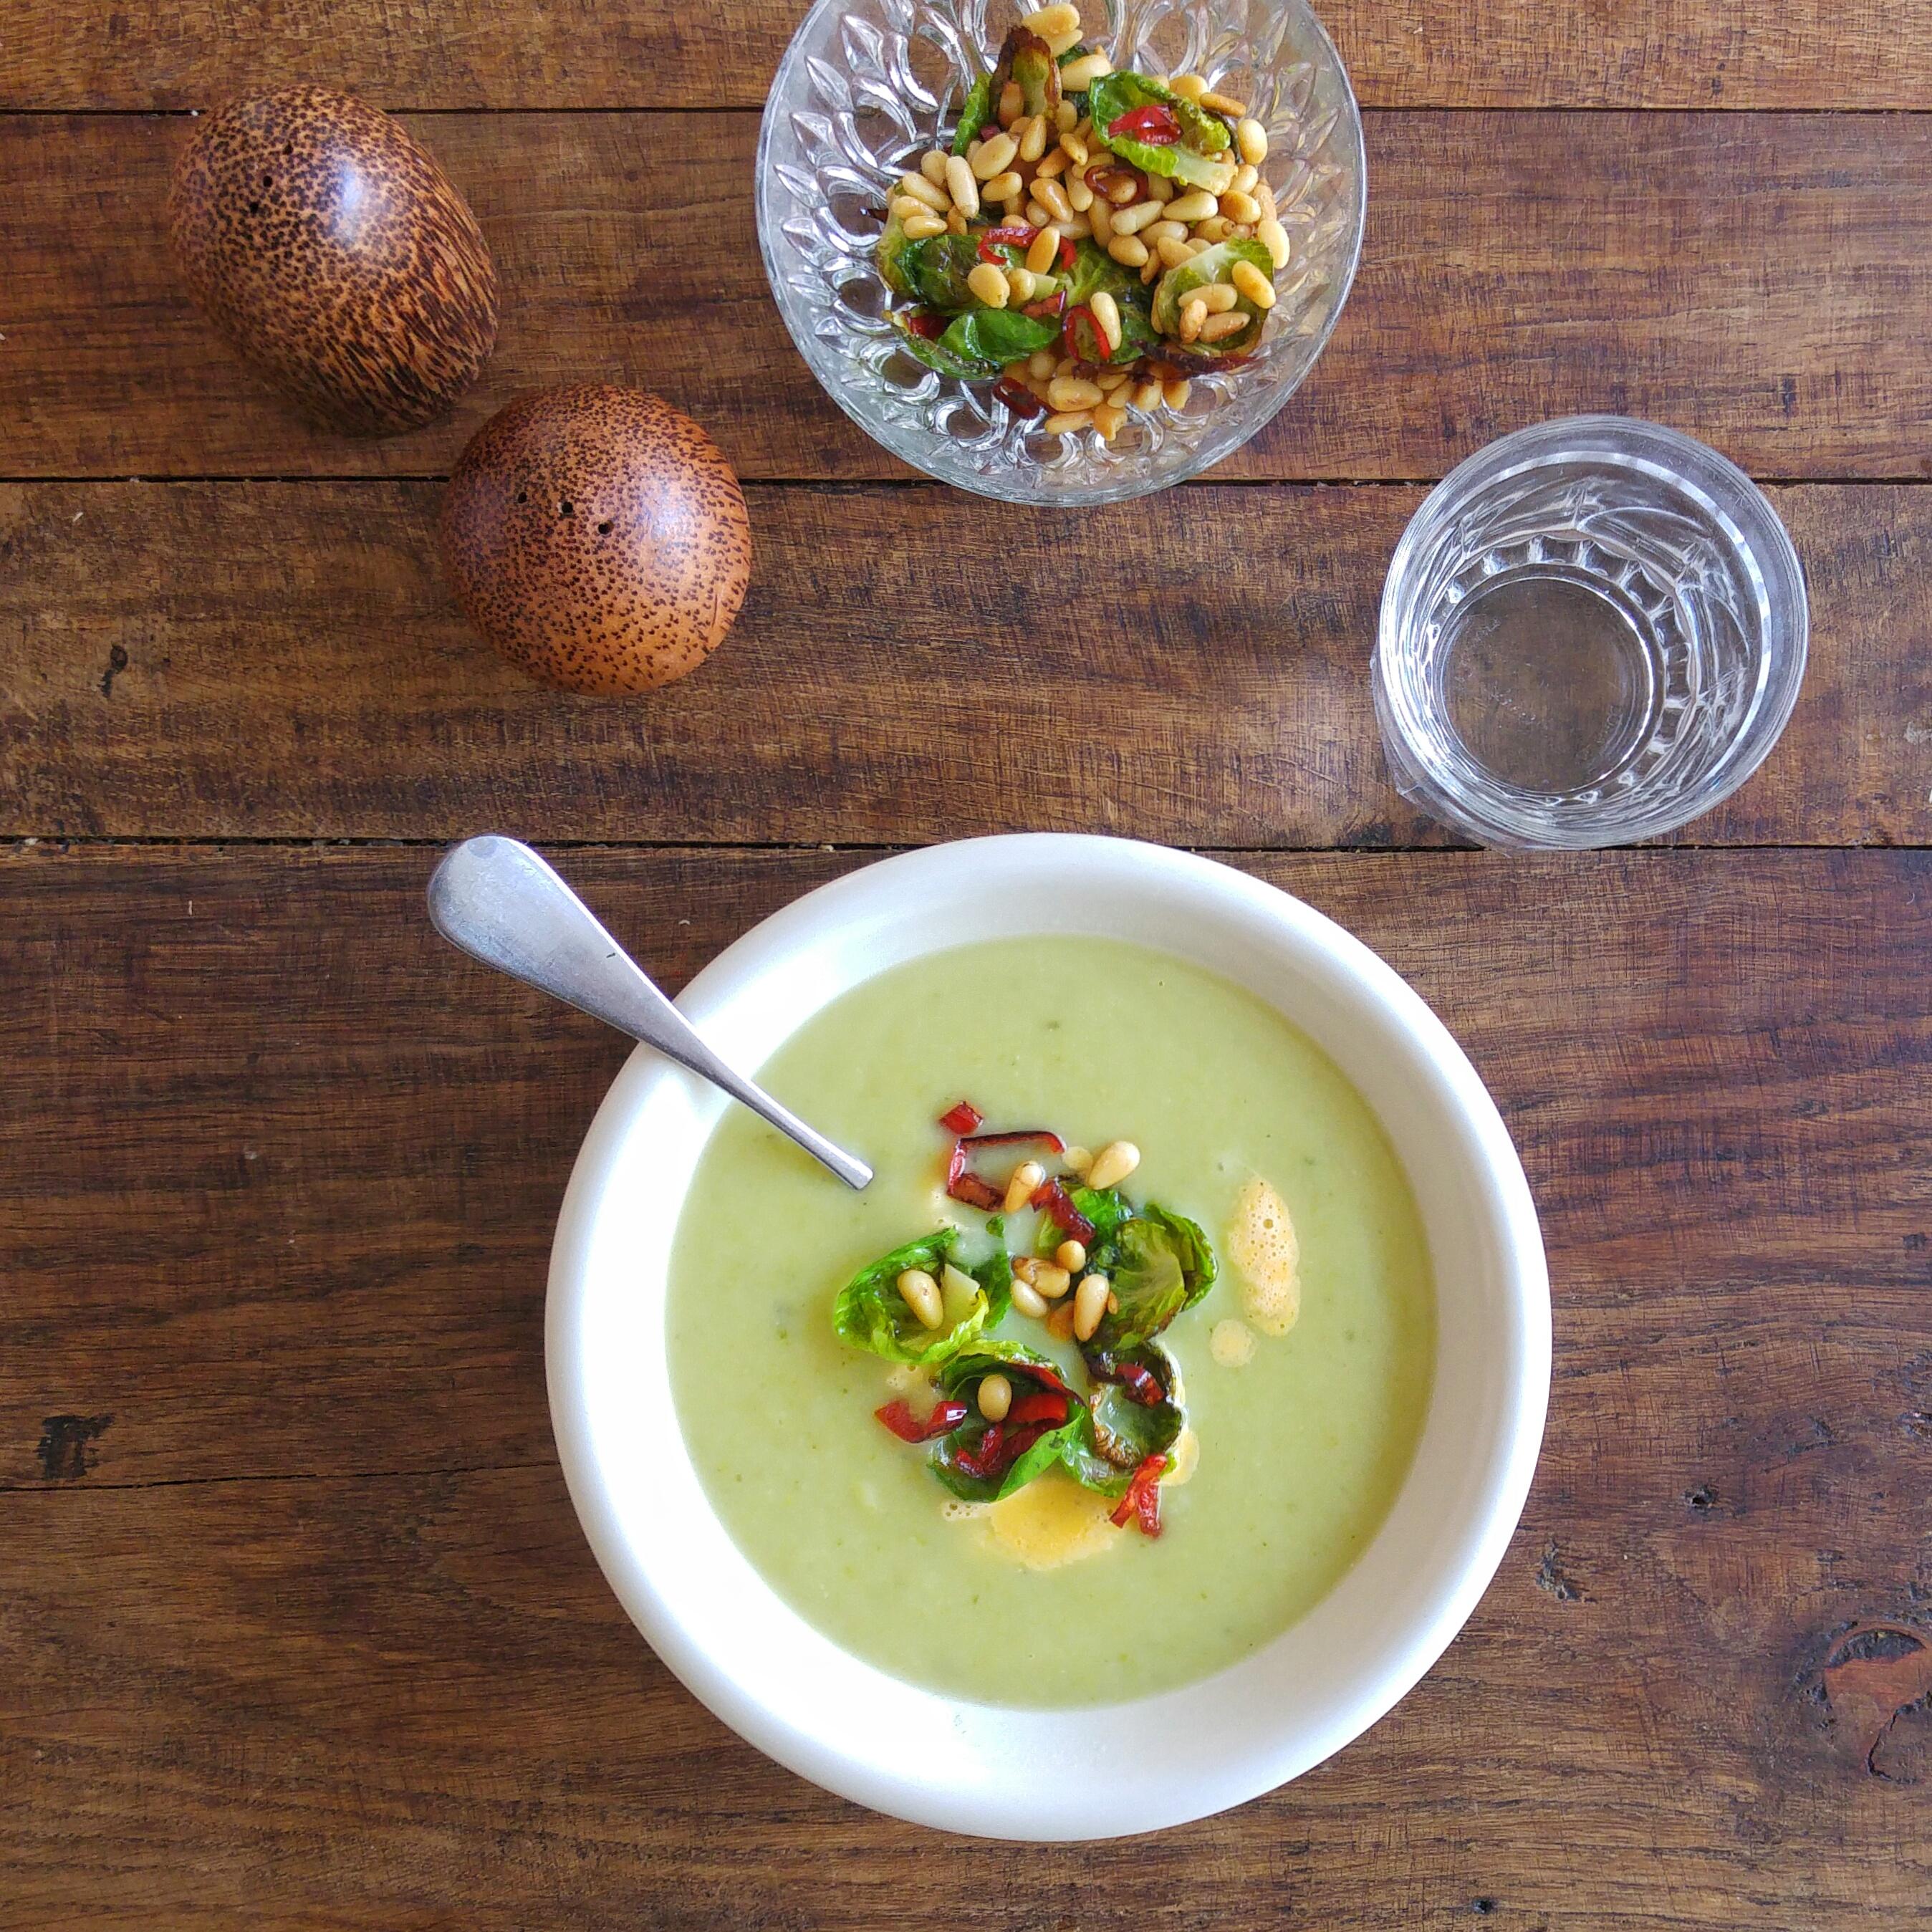 wpid-soupe-de-la-semaine-spruitjessoep-kom.jpeg